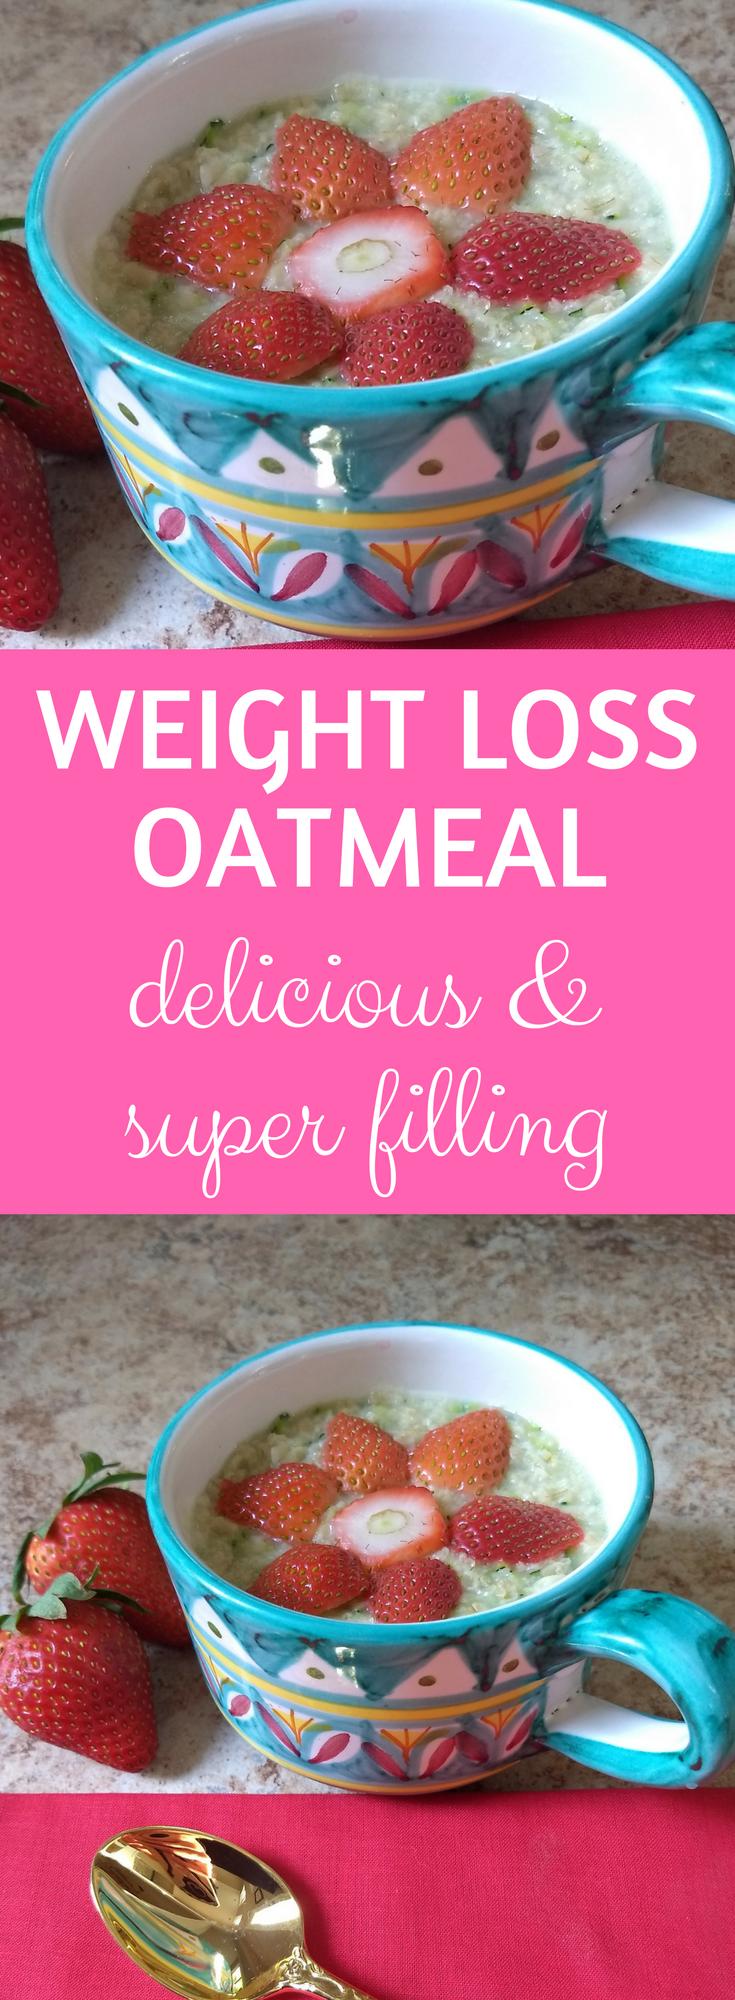 Supercharged Oatmeal Sleek Technique Healthy breakfast